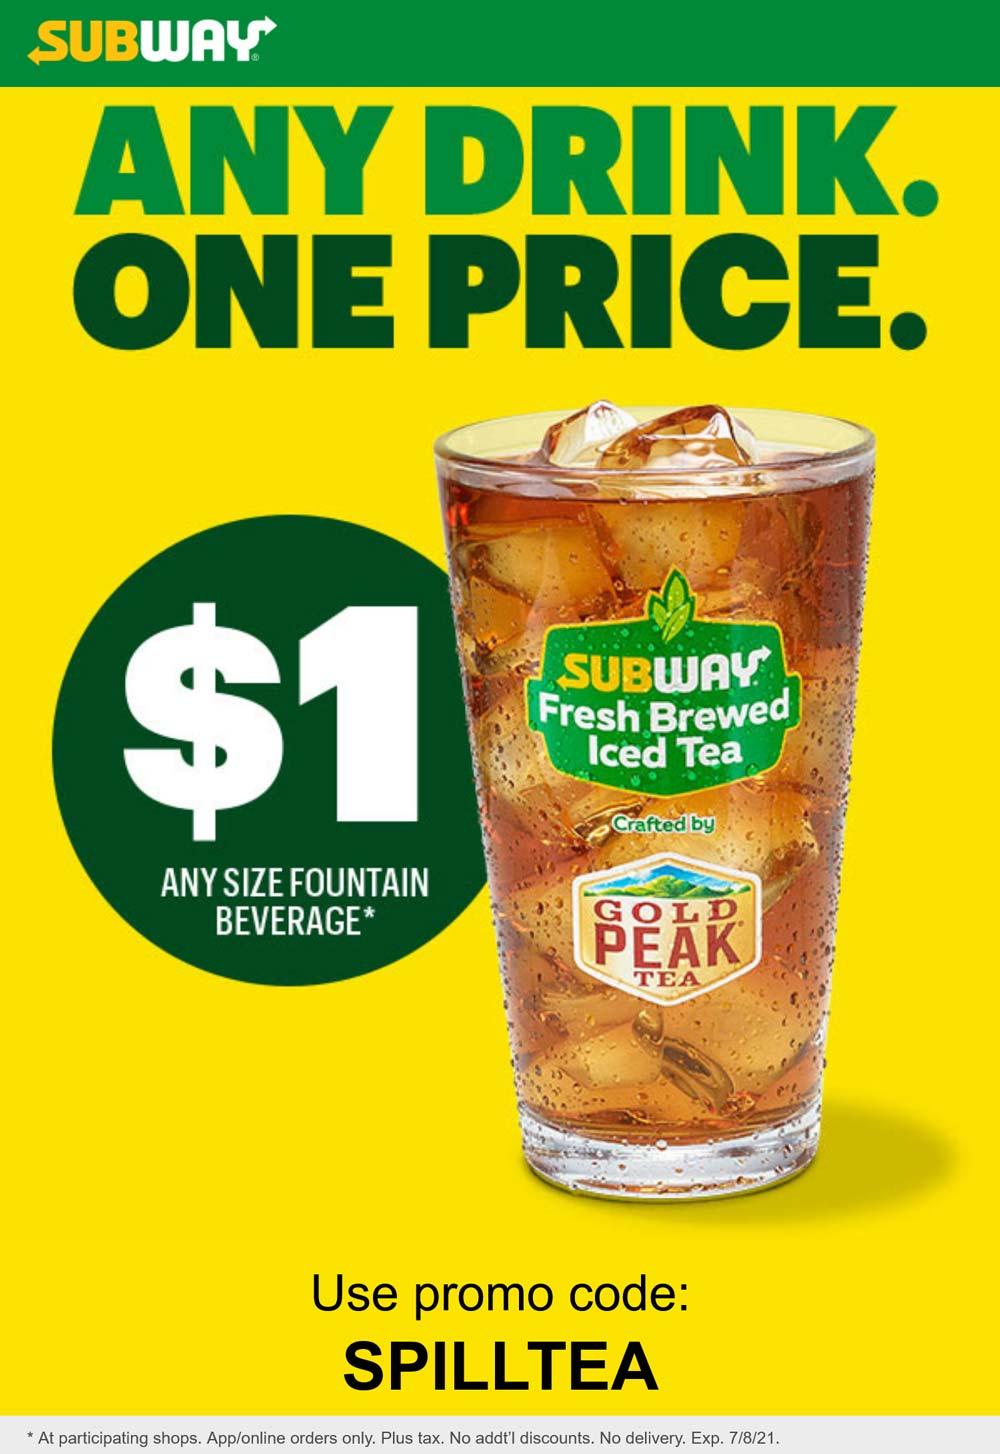 Subway restaurants Coupon  $1 large drinks at Subway sandwich shops via promo code SPILLTEA #subway